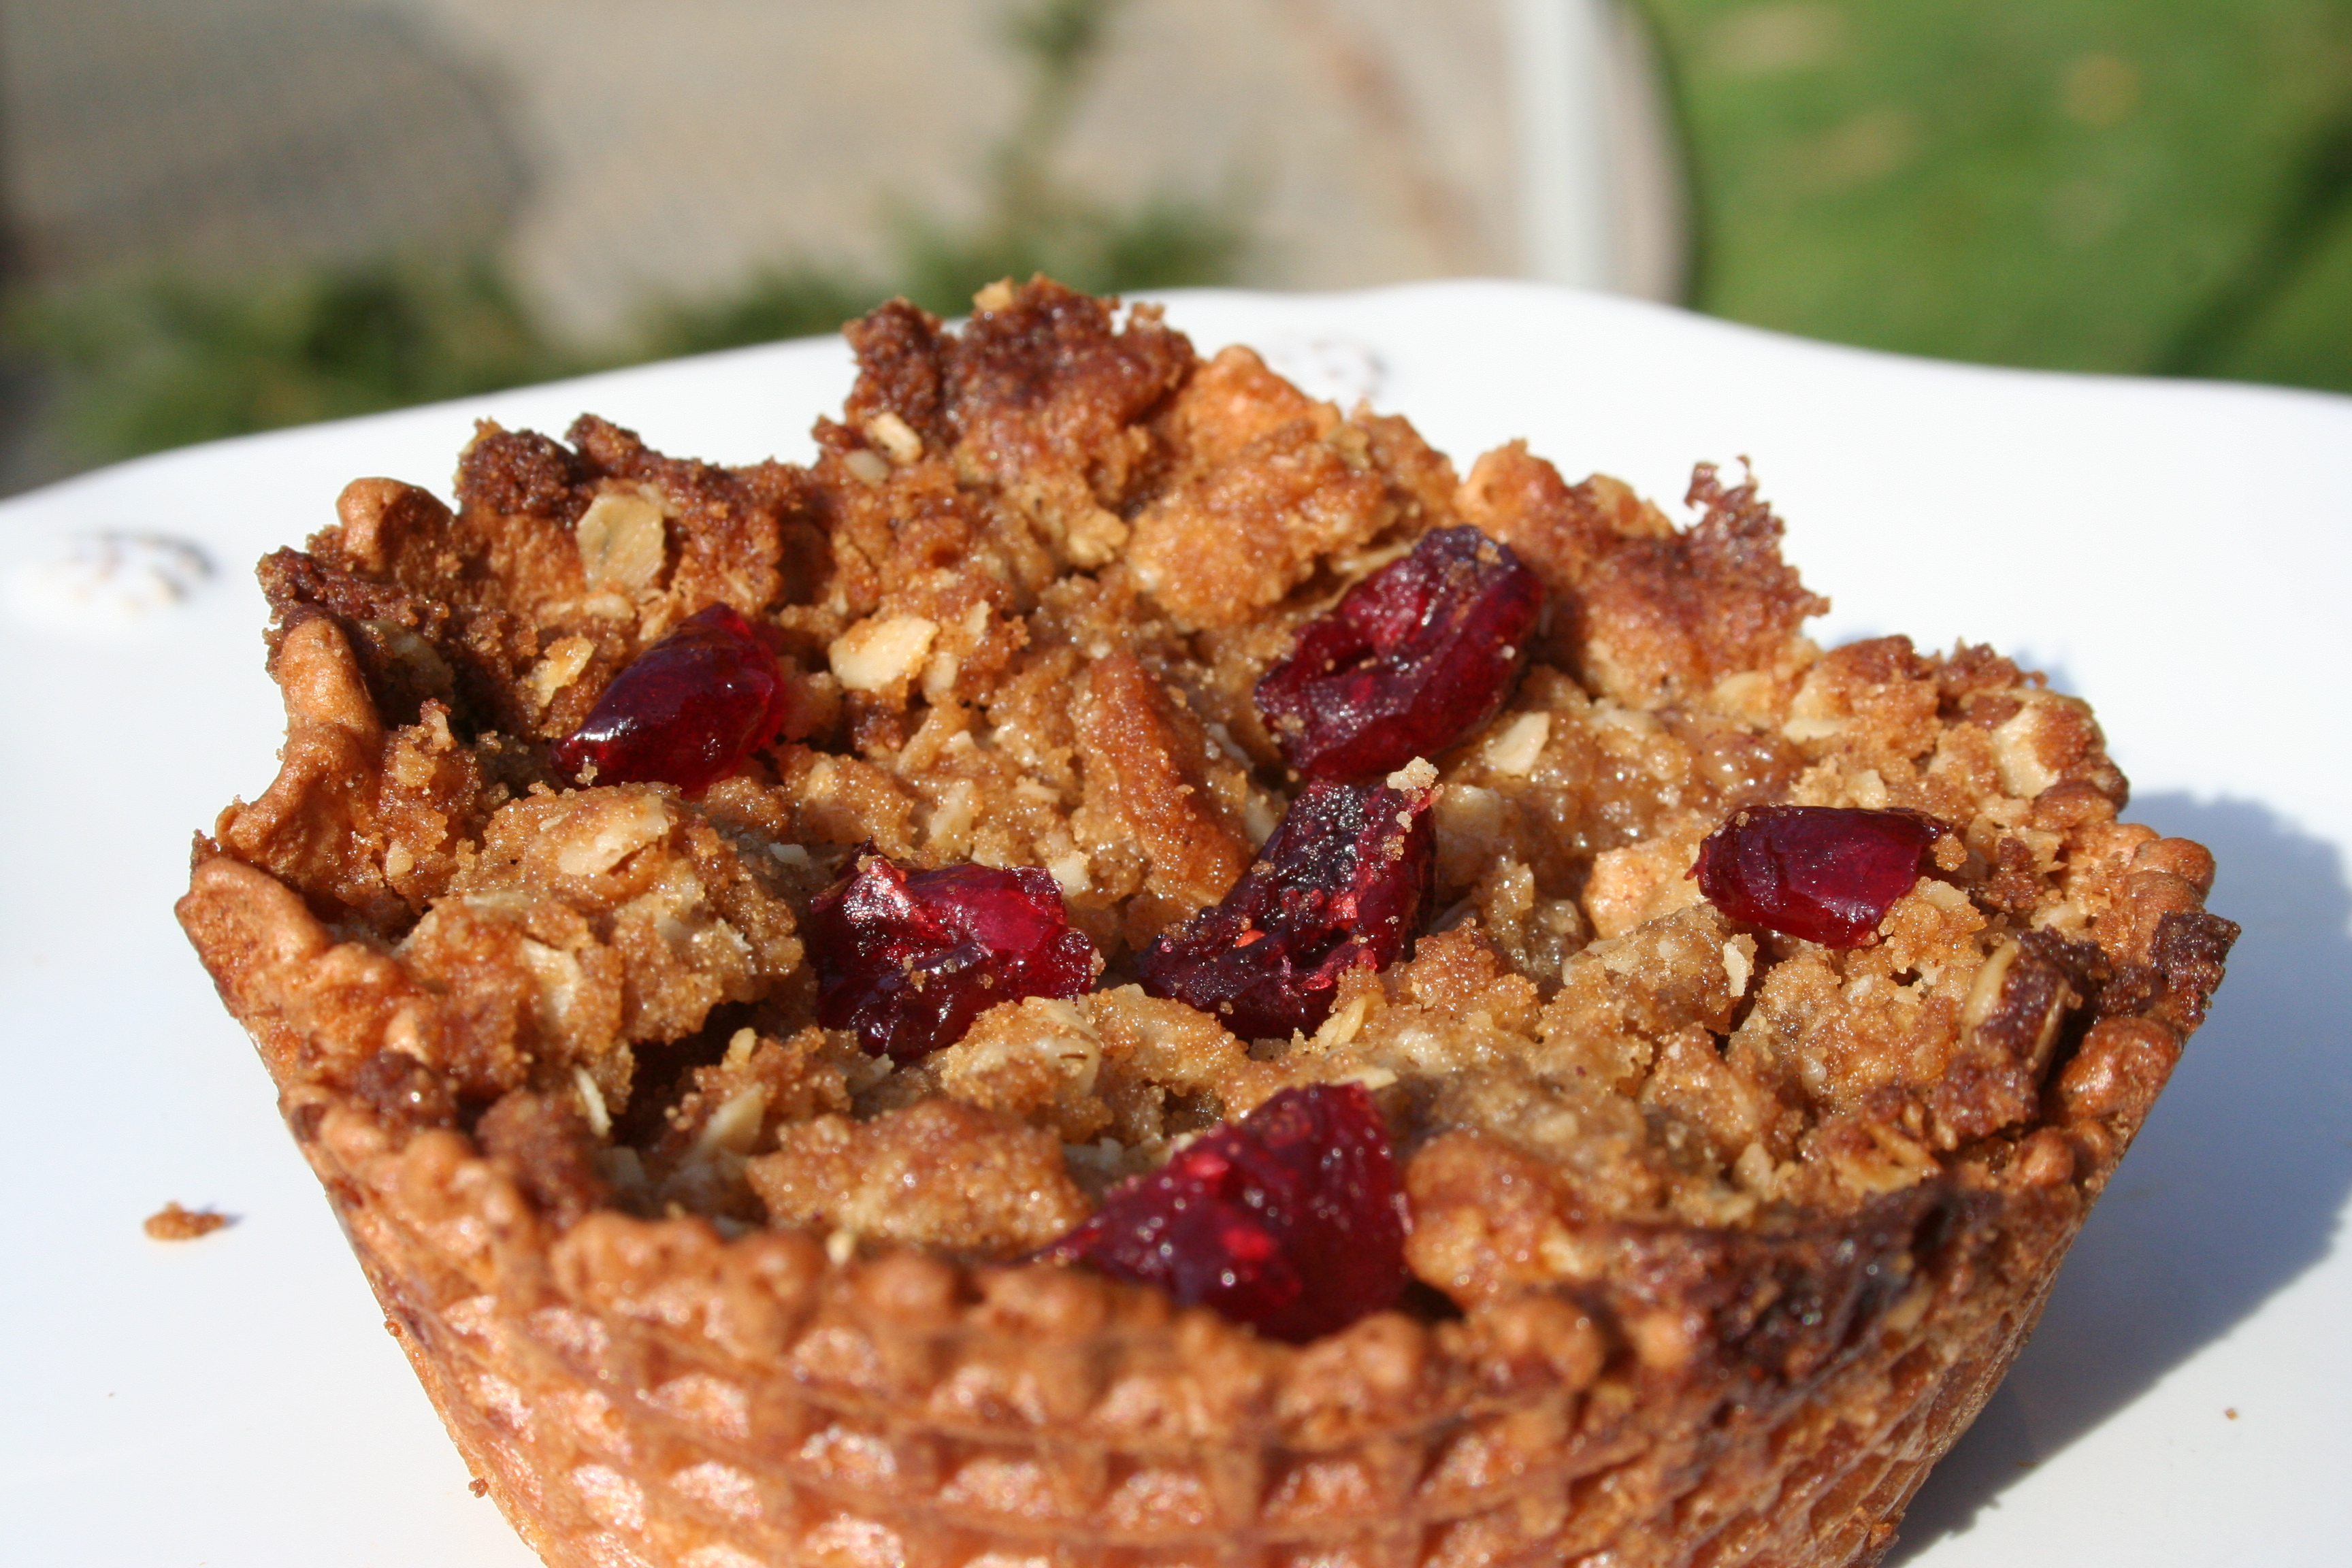 Apple Cranberry Bowl